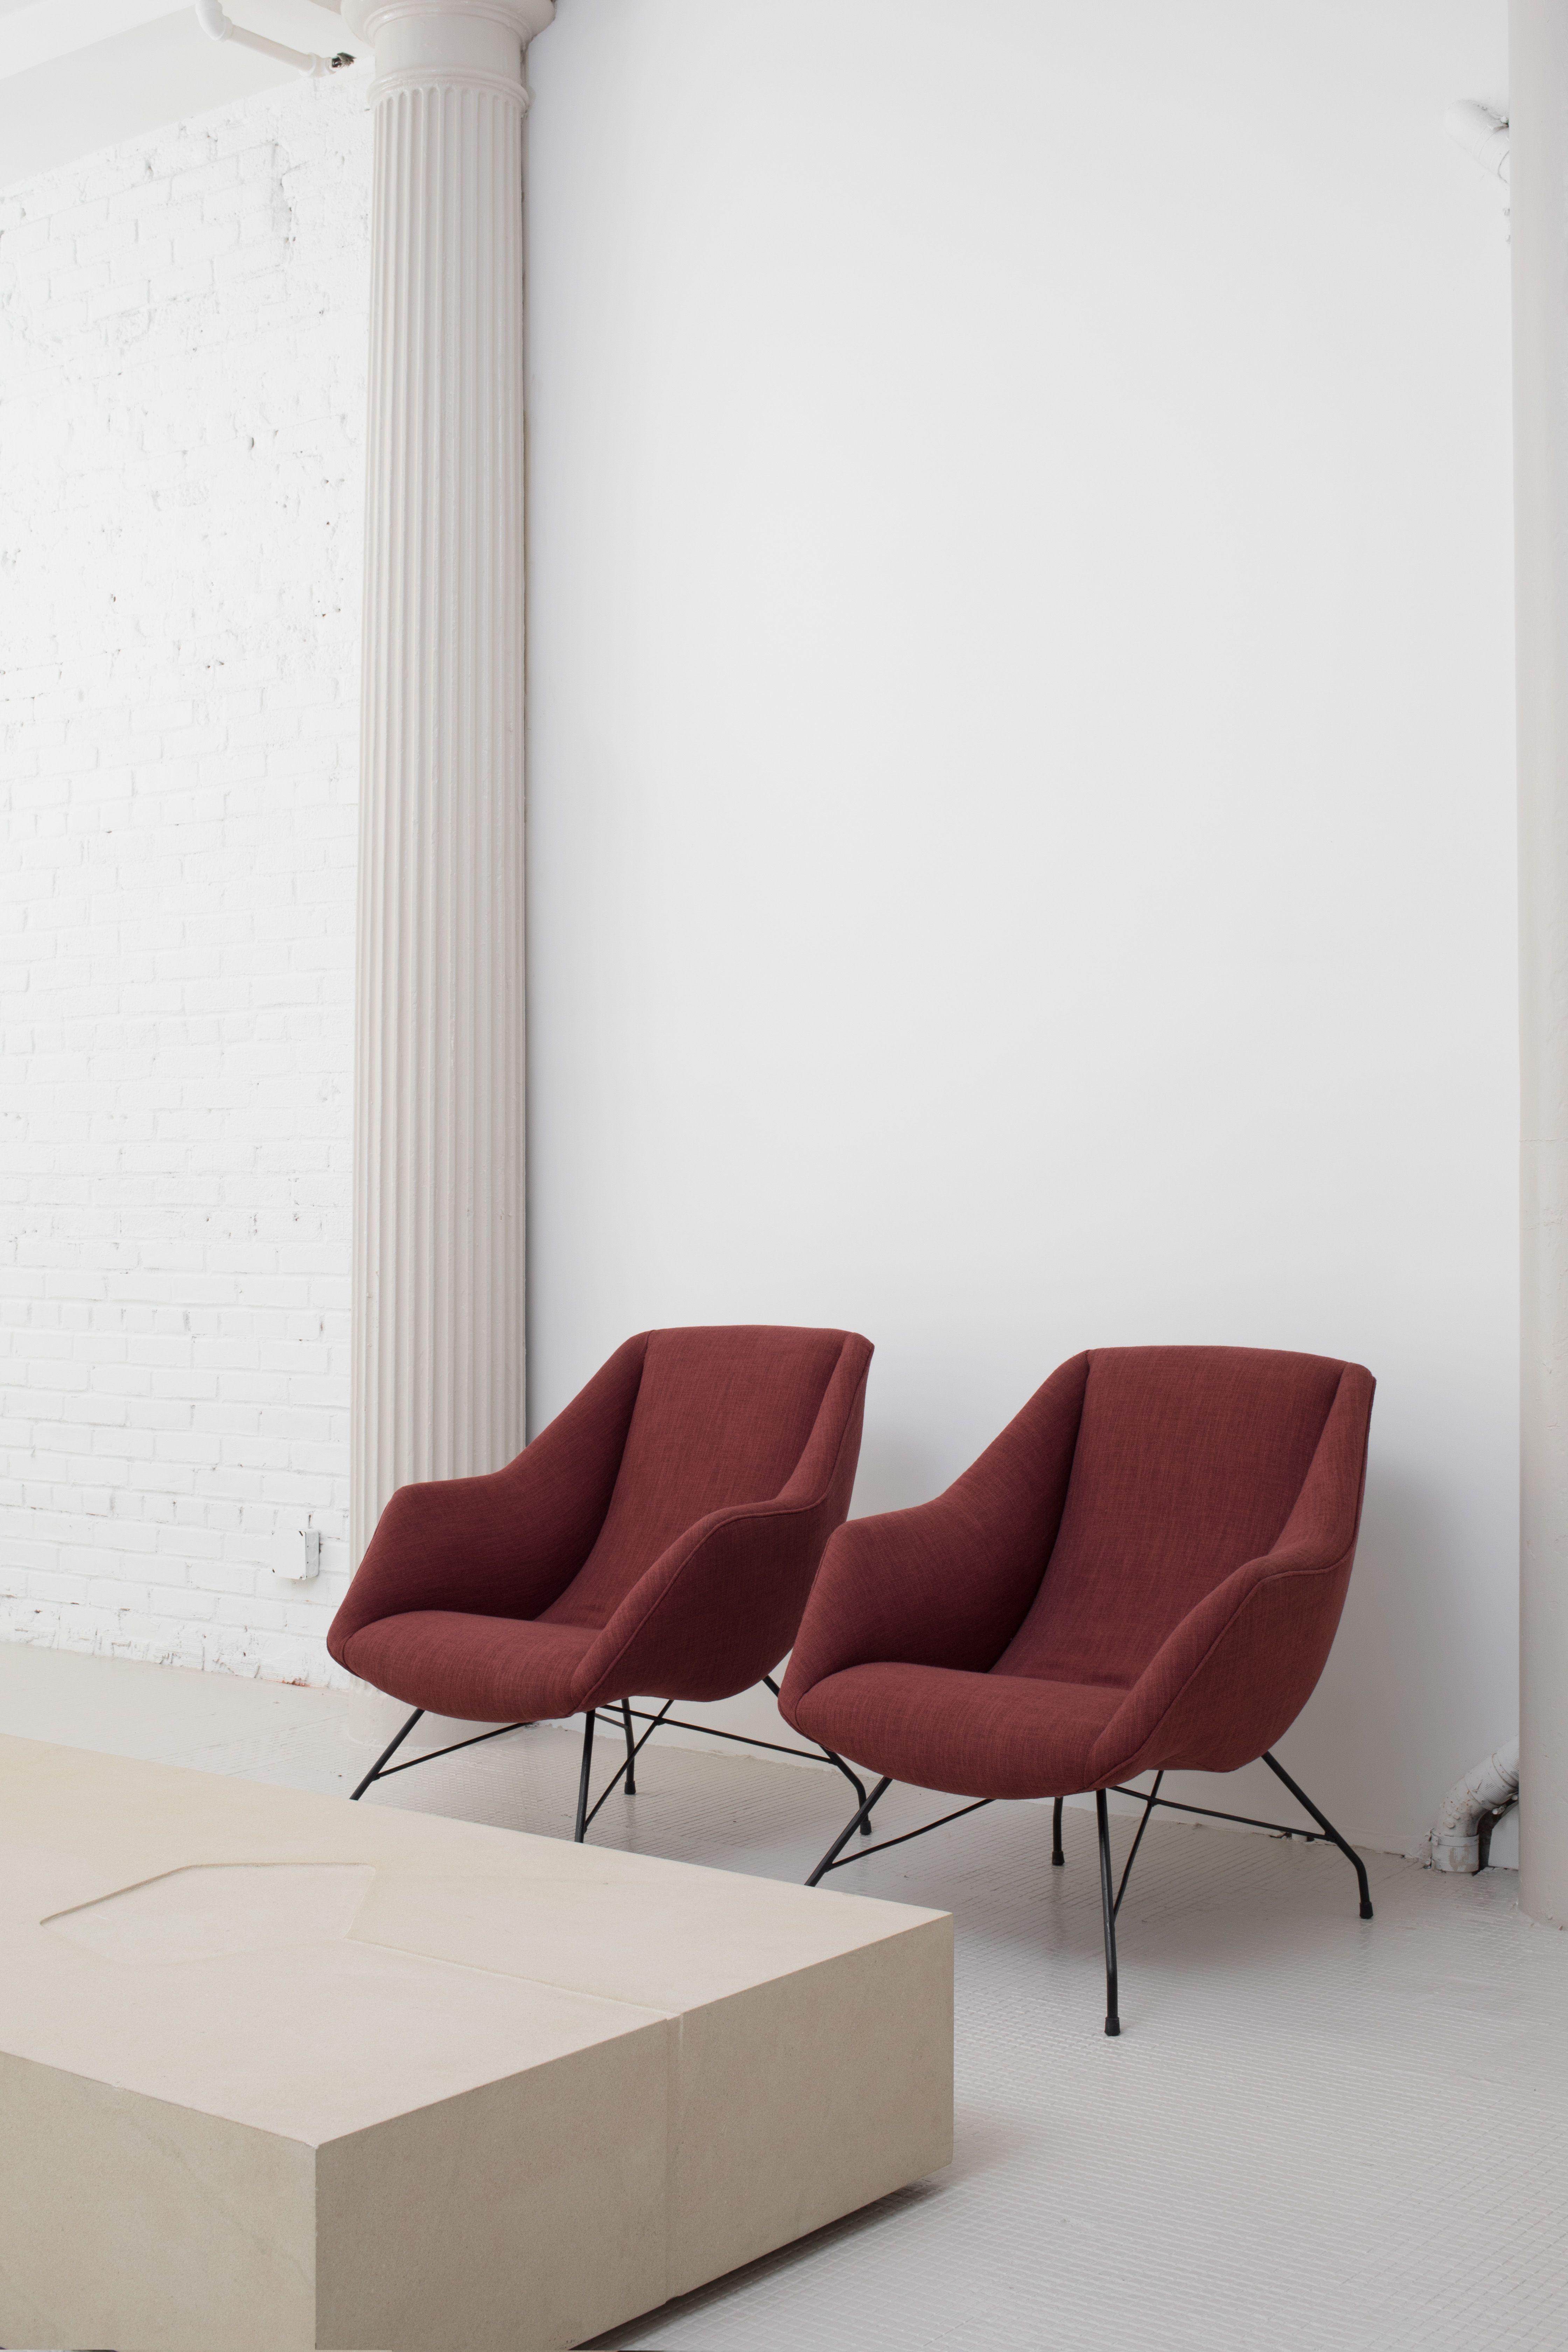 Vintage innenarchitektur vintage s armchairs by martin eisler  armchairs designers and